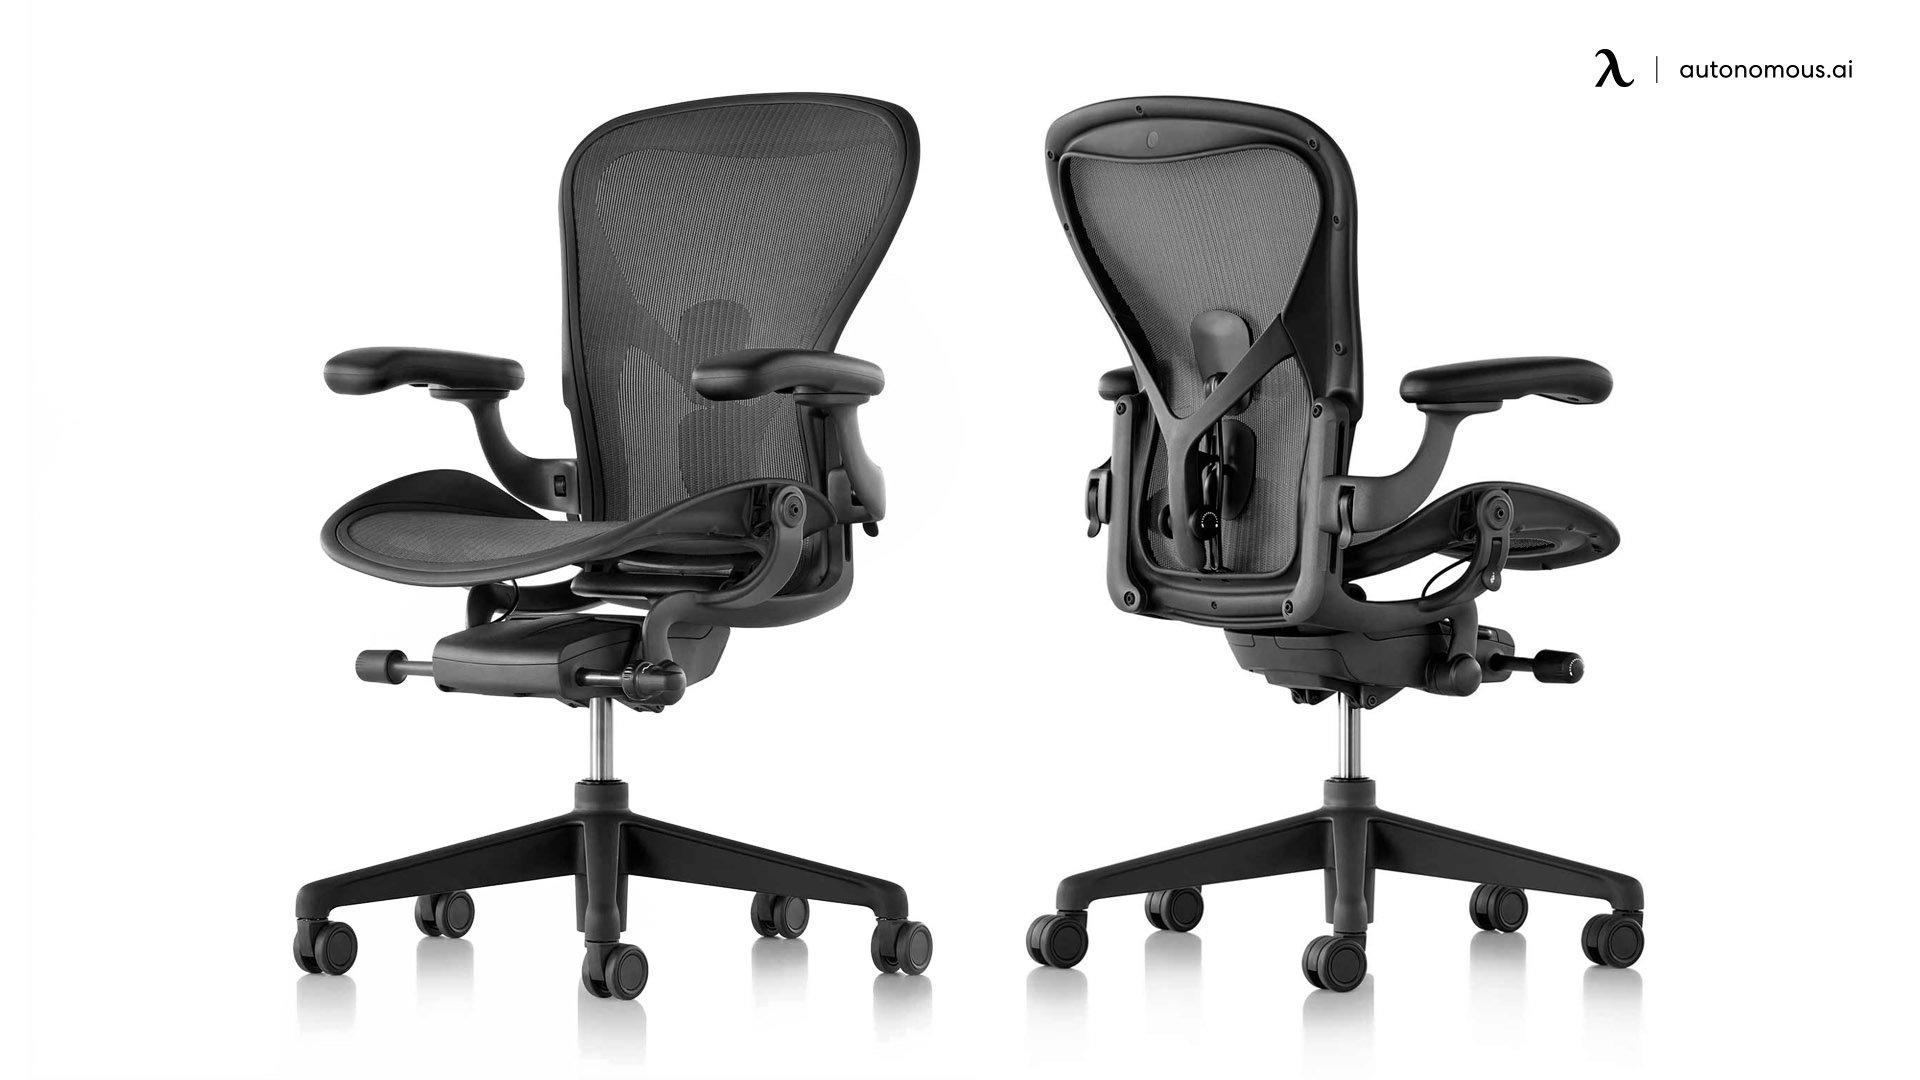 Aeron Ergonomic Chair from Herman Miller